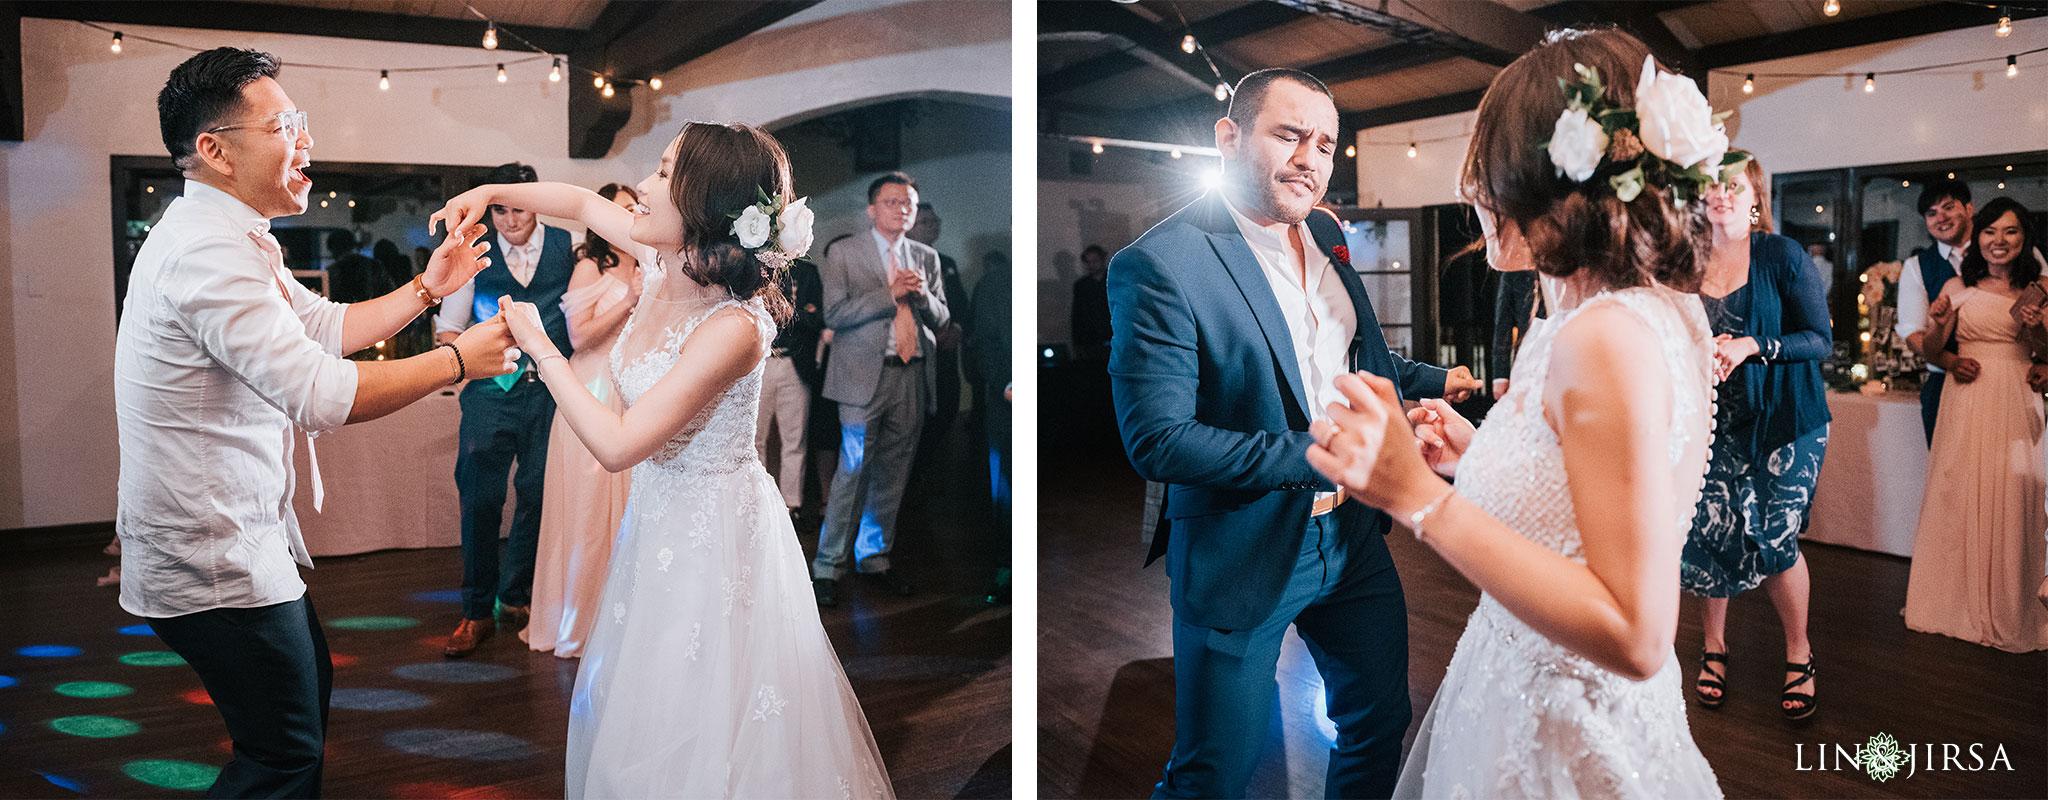 52 ole hanson beach club san clemente wedding reception photography